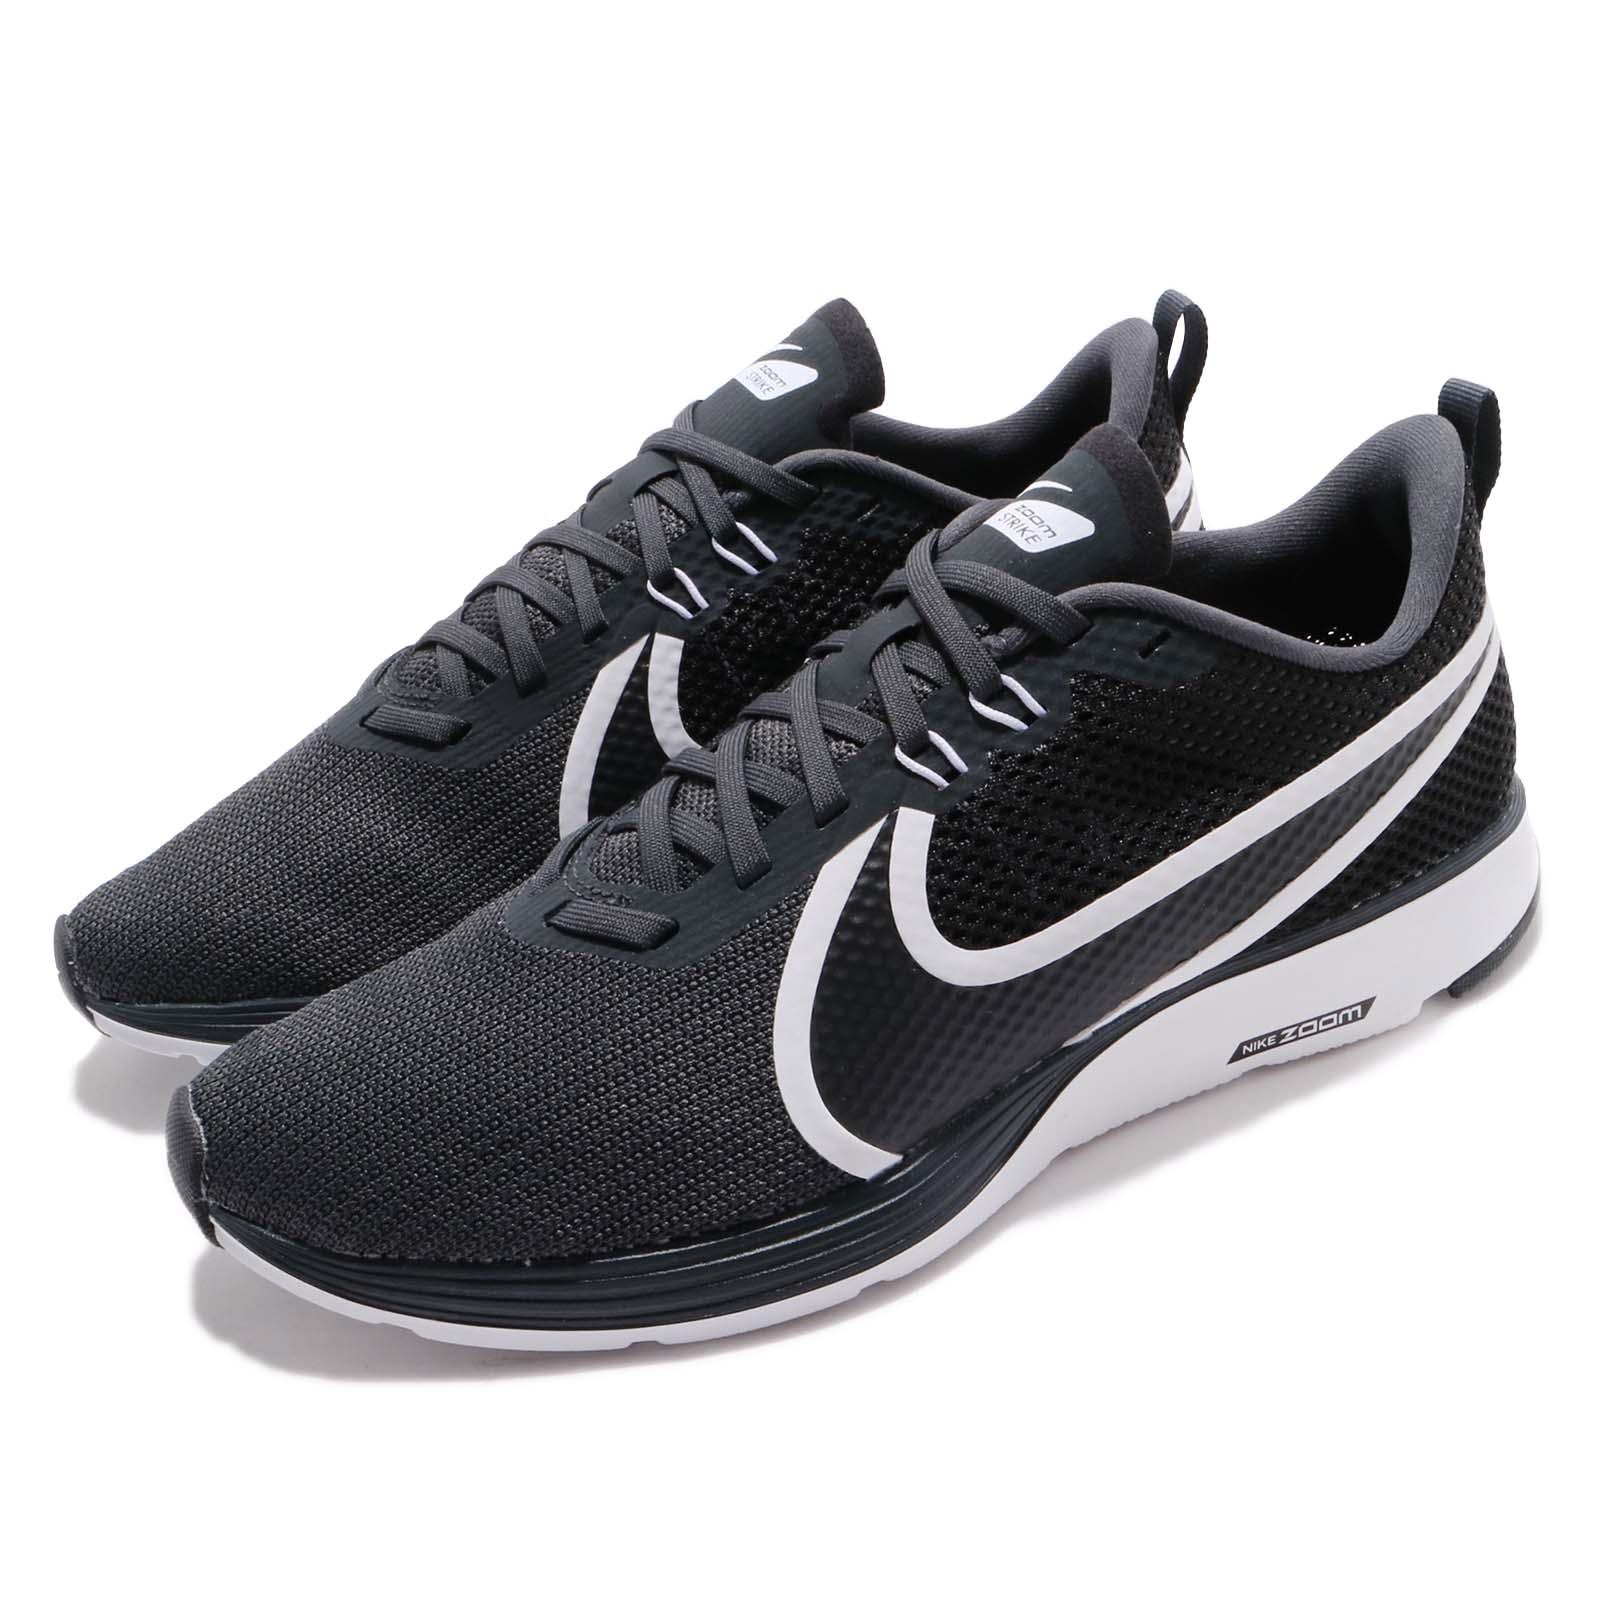 Nike 慢跑鞋 Zoom Strike 2 男鞋 AO1912-001